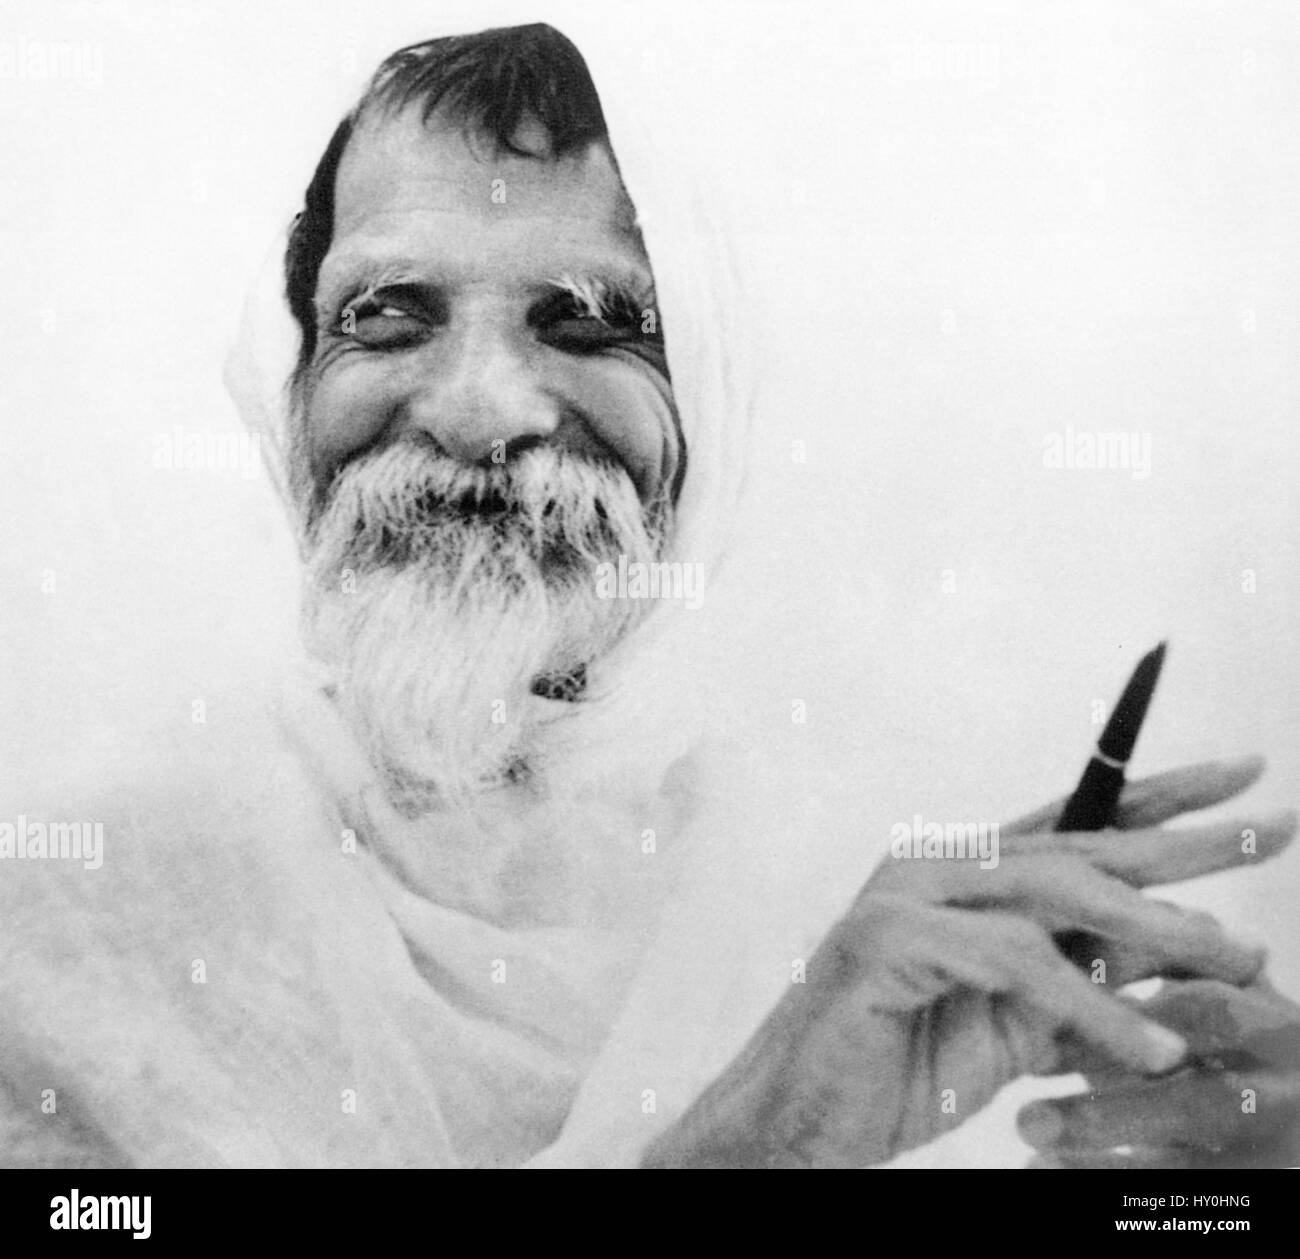 Indian advocate of nonviolence, vinoba bhave, india, asia, 1962 - Stock Image